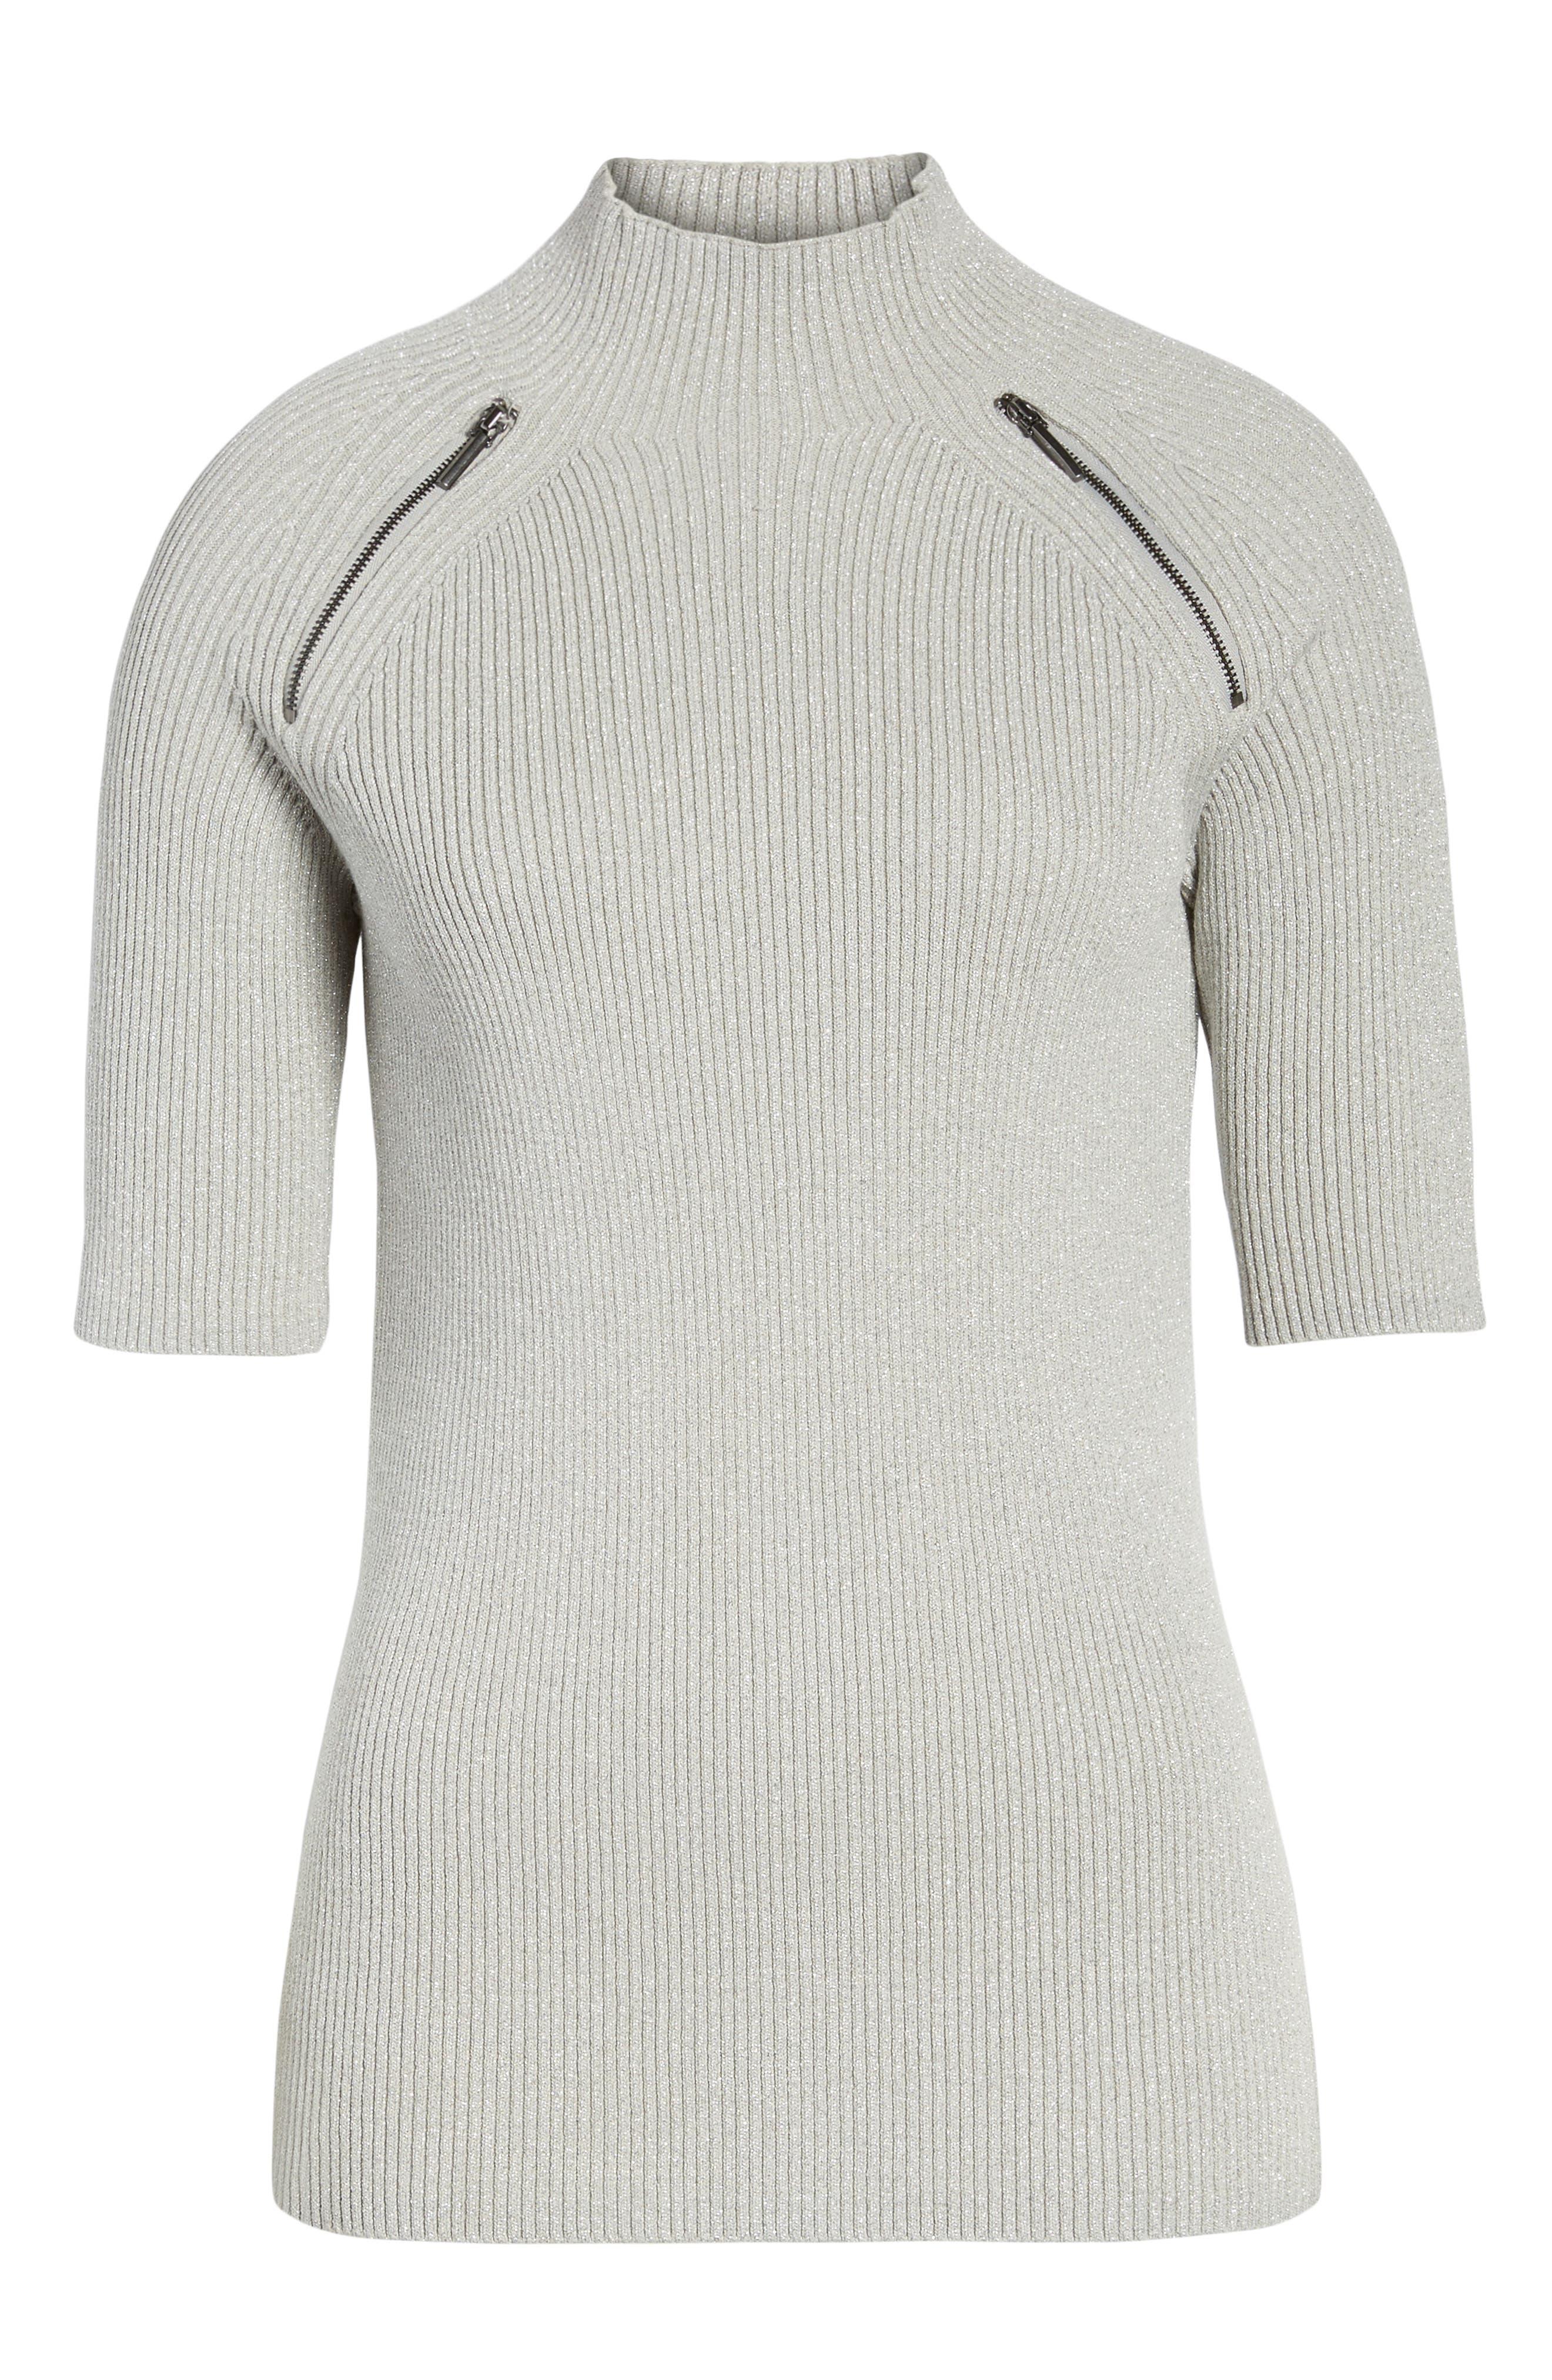 Elbow Sleeve Mock Neck Sweater,                             Alternate thumbnail 6, color,                             LIGHT GRAY